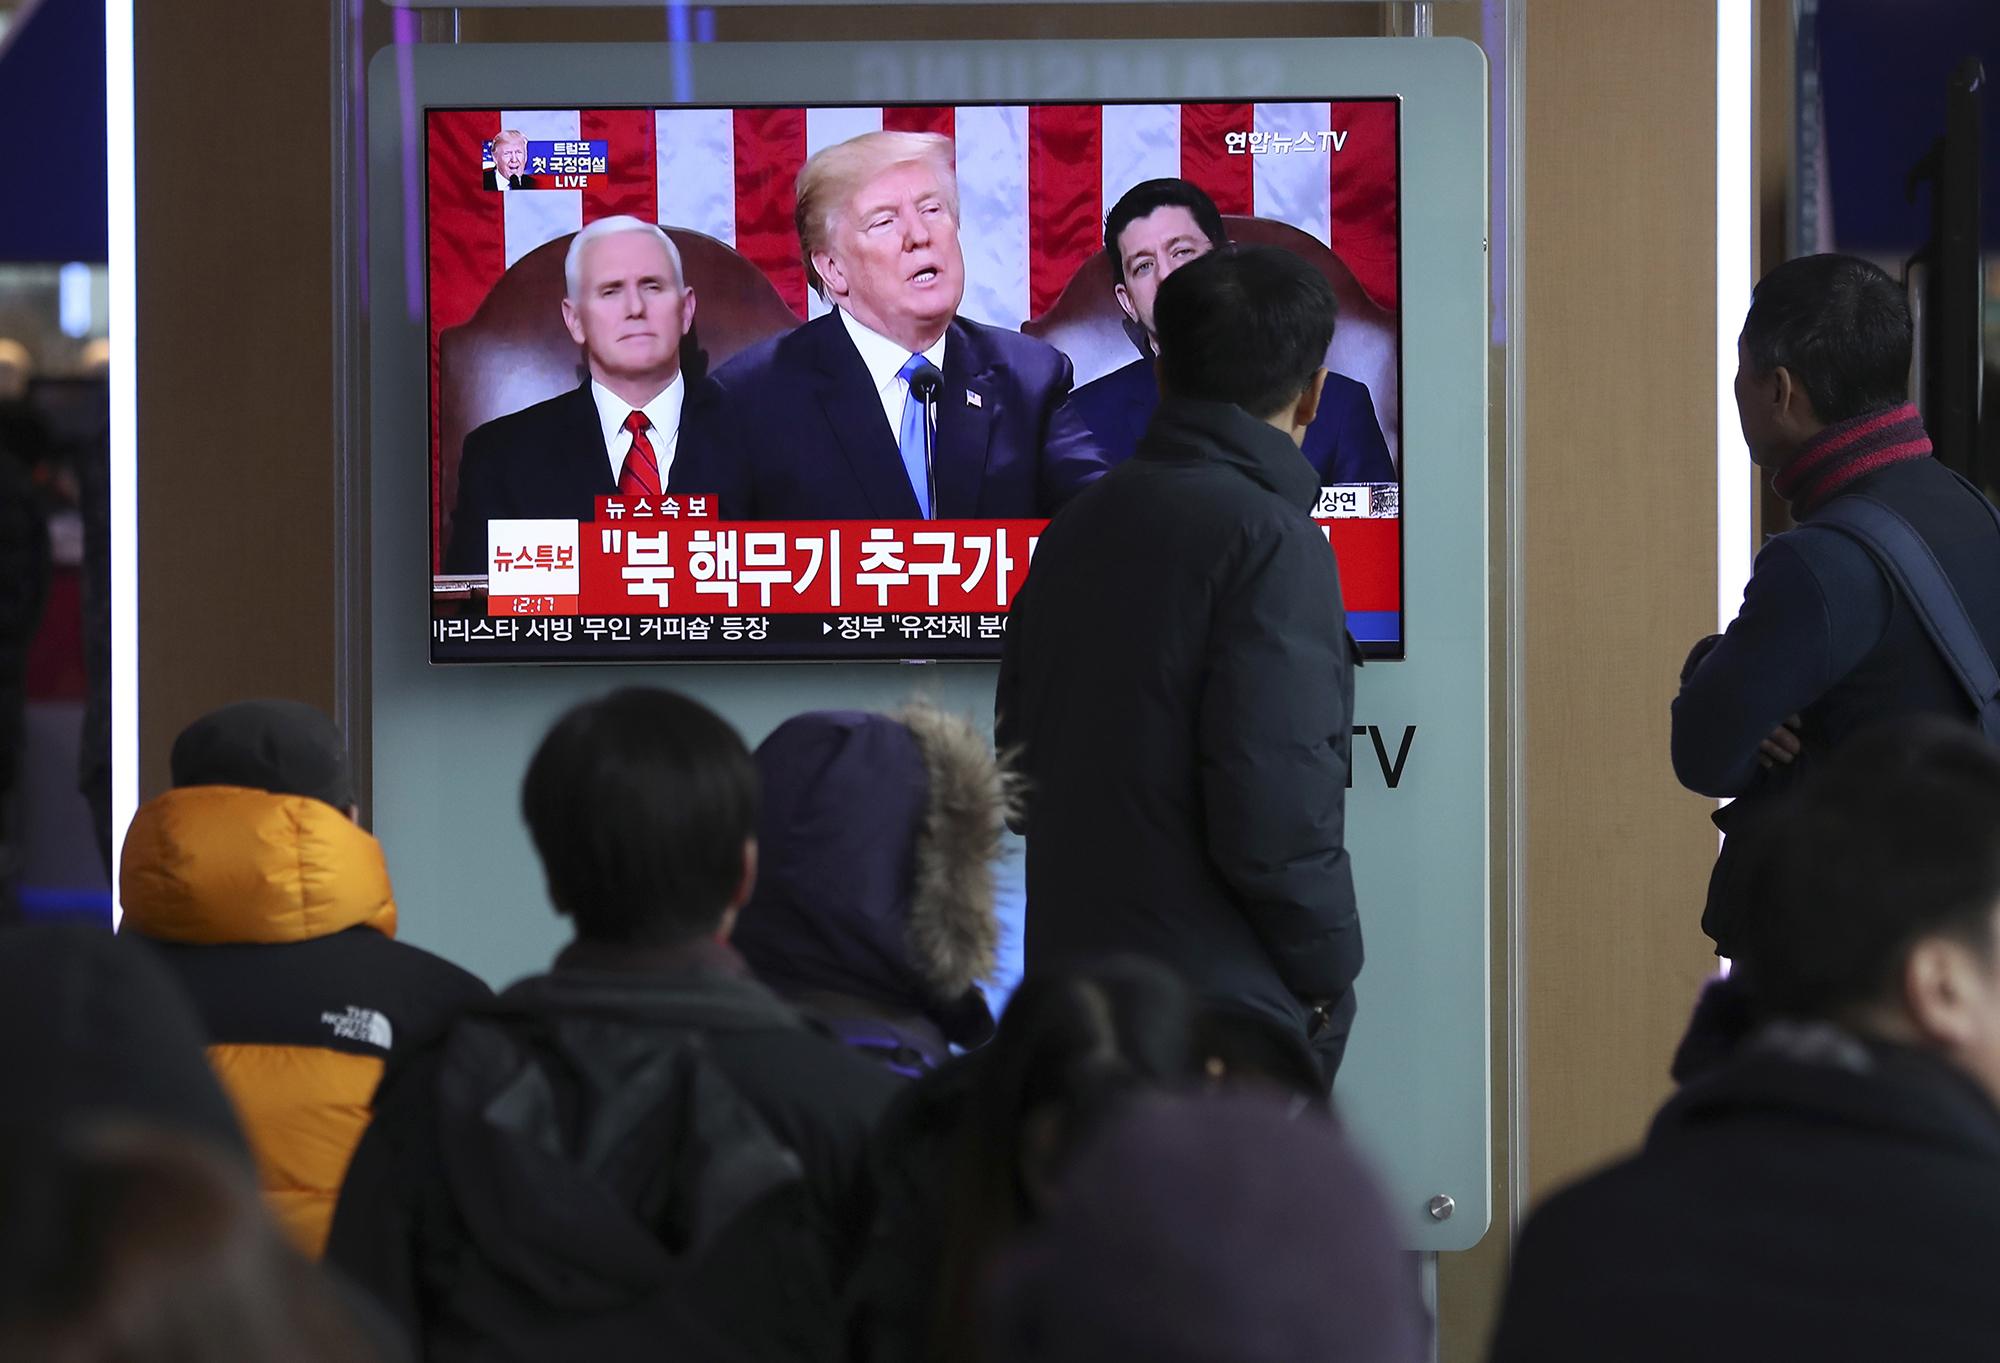 Trump speaks to Japan's PM, S Korea's President about North Korea